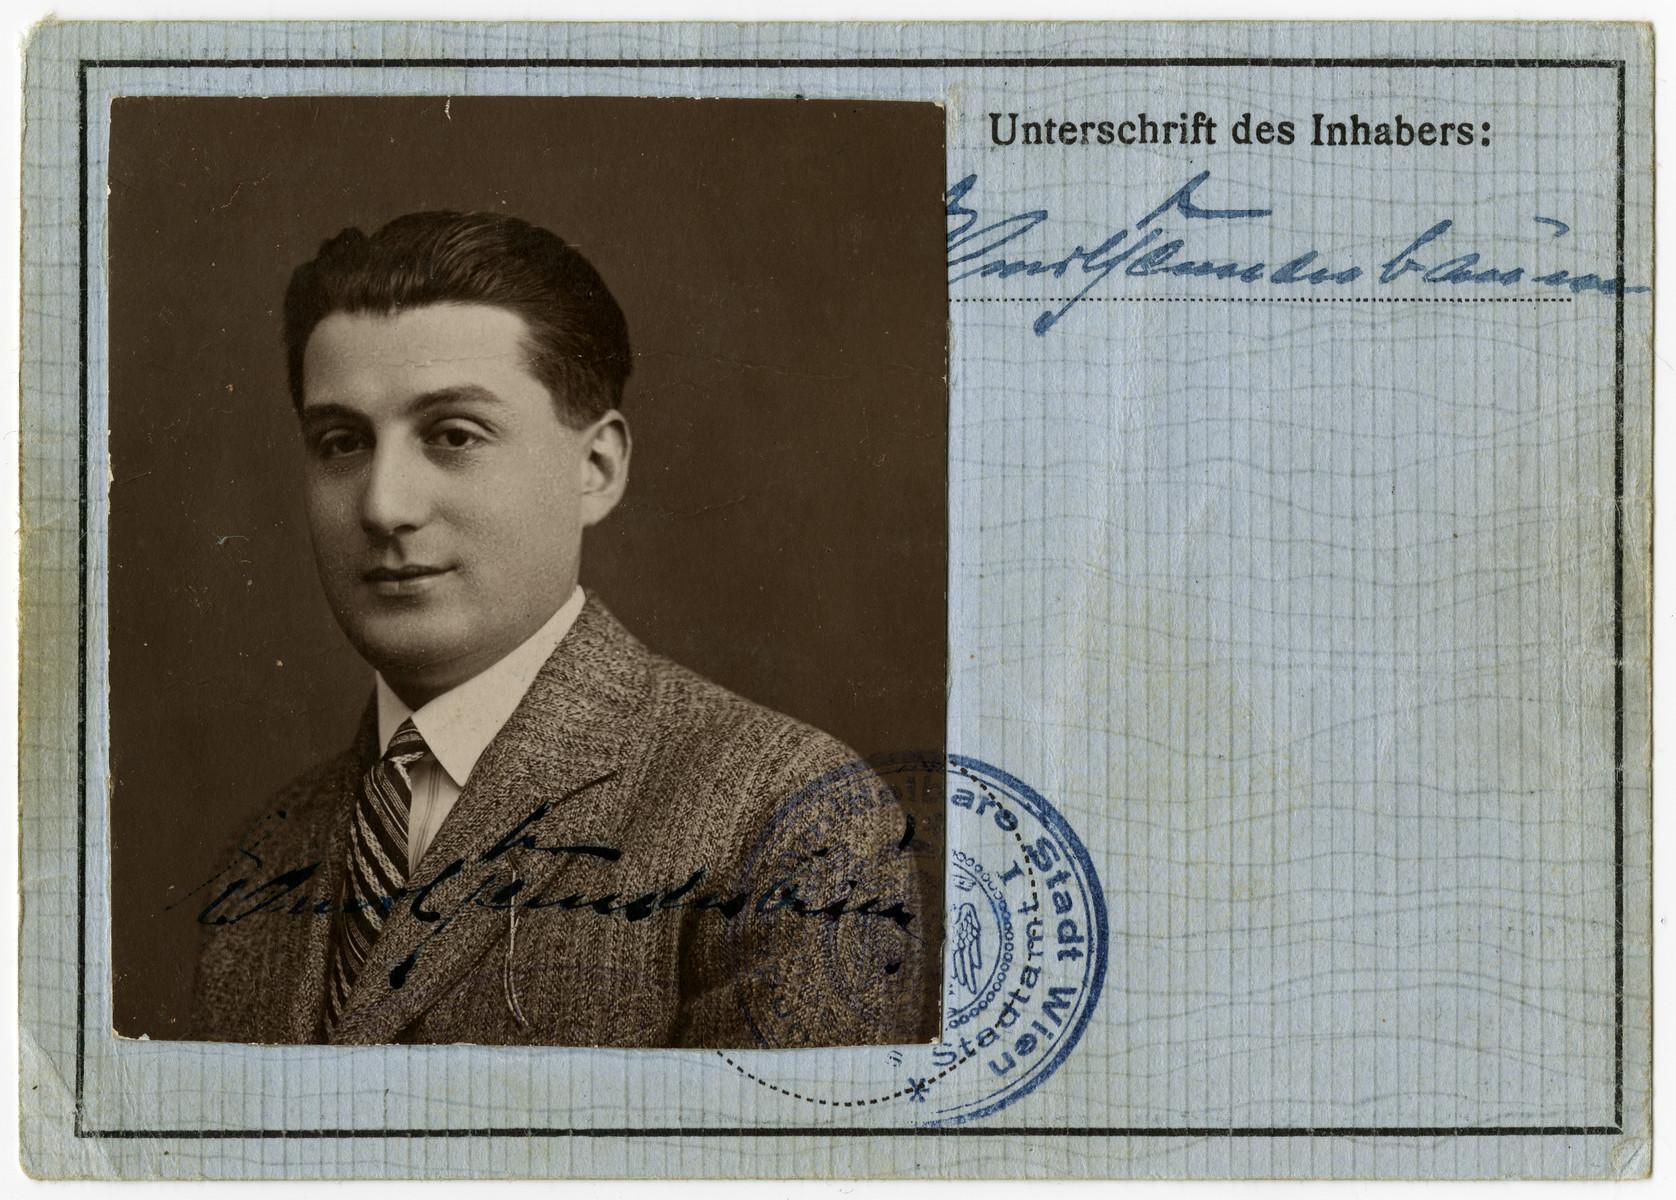 Identification/registration card issued to Emil Tennenbaum.